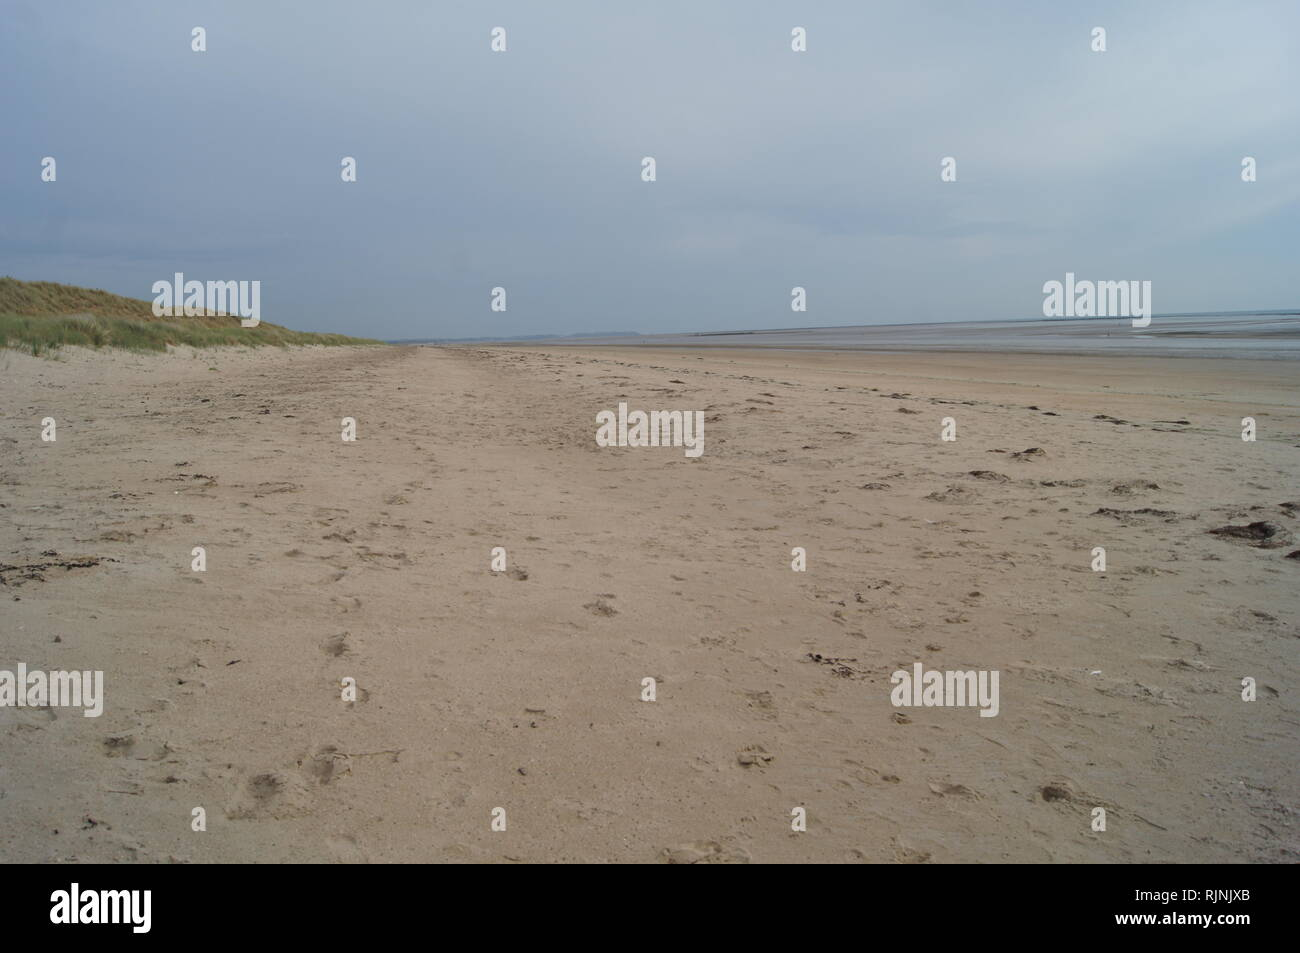 nice beach,best beaches,beach france,europa,landscape,sun,sailing,surfing,alone,swimming,sport,holiday,dog walk,summer,sun creme,atlanic,ozean,sea - Stock Image